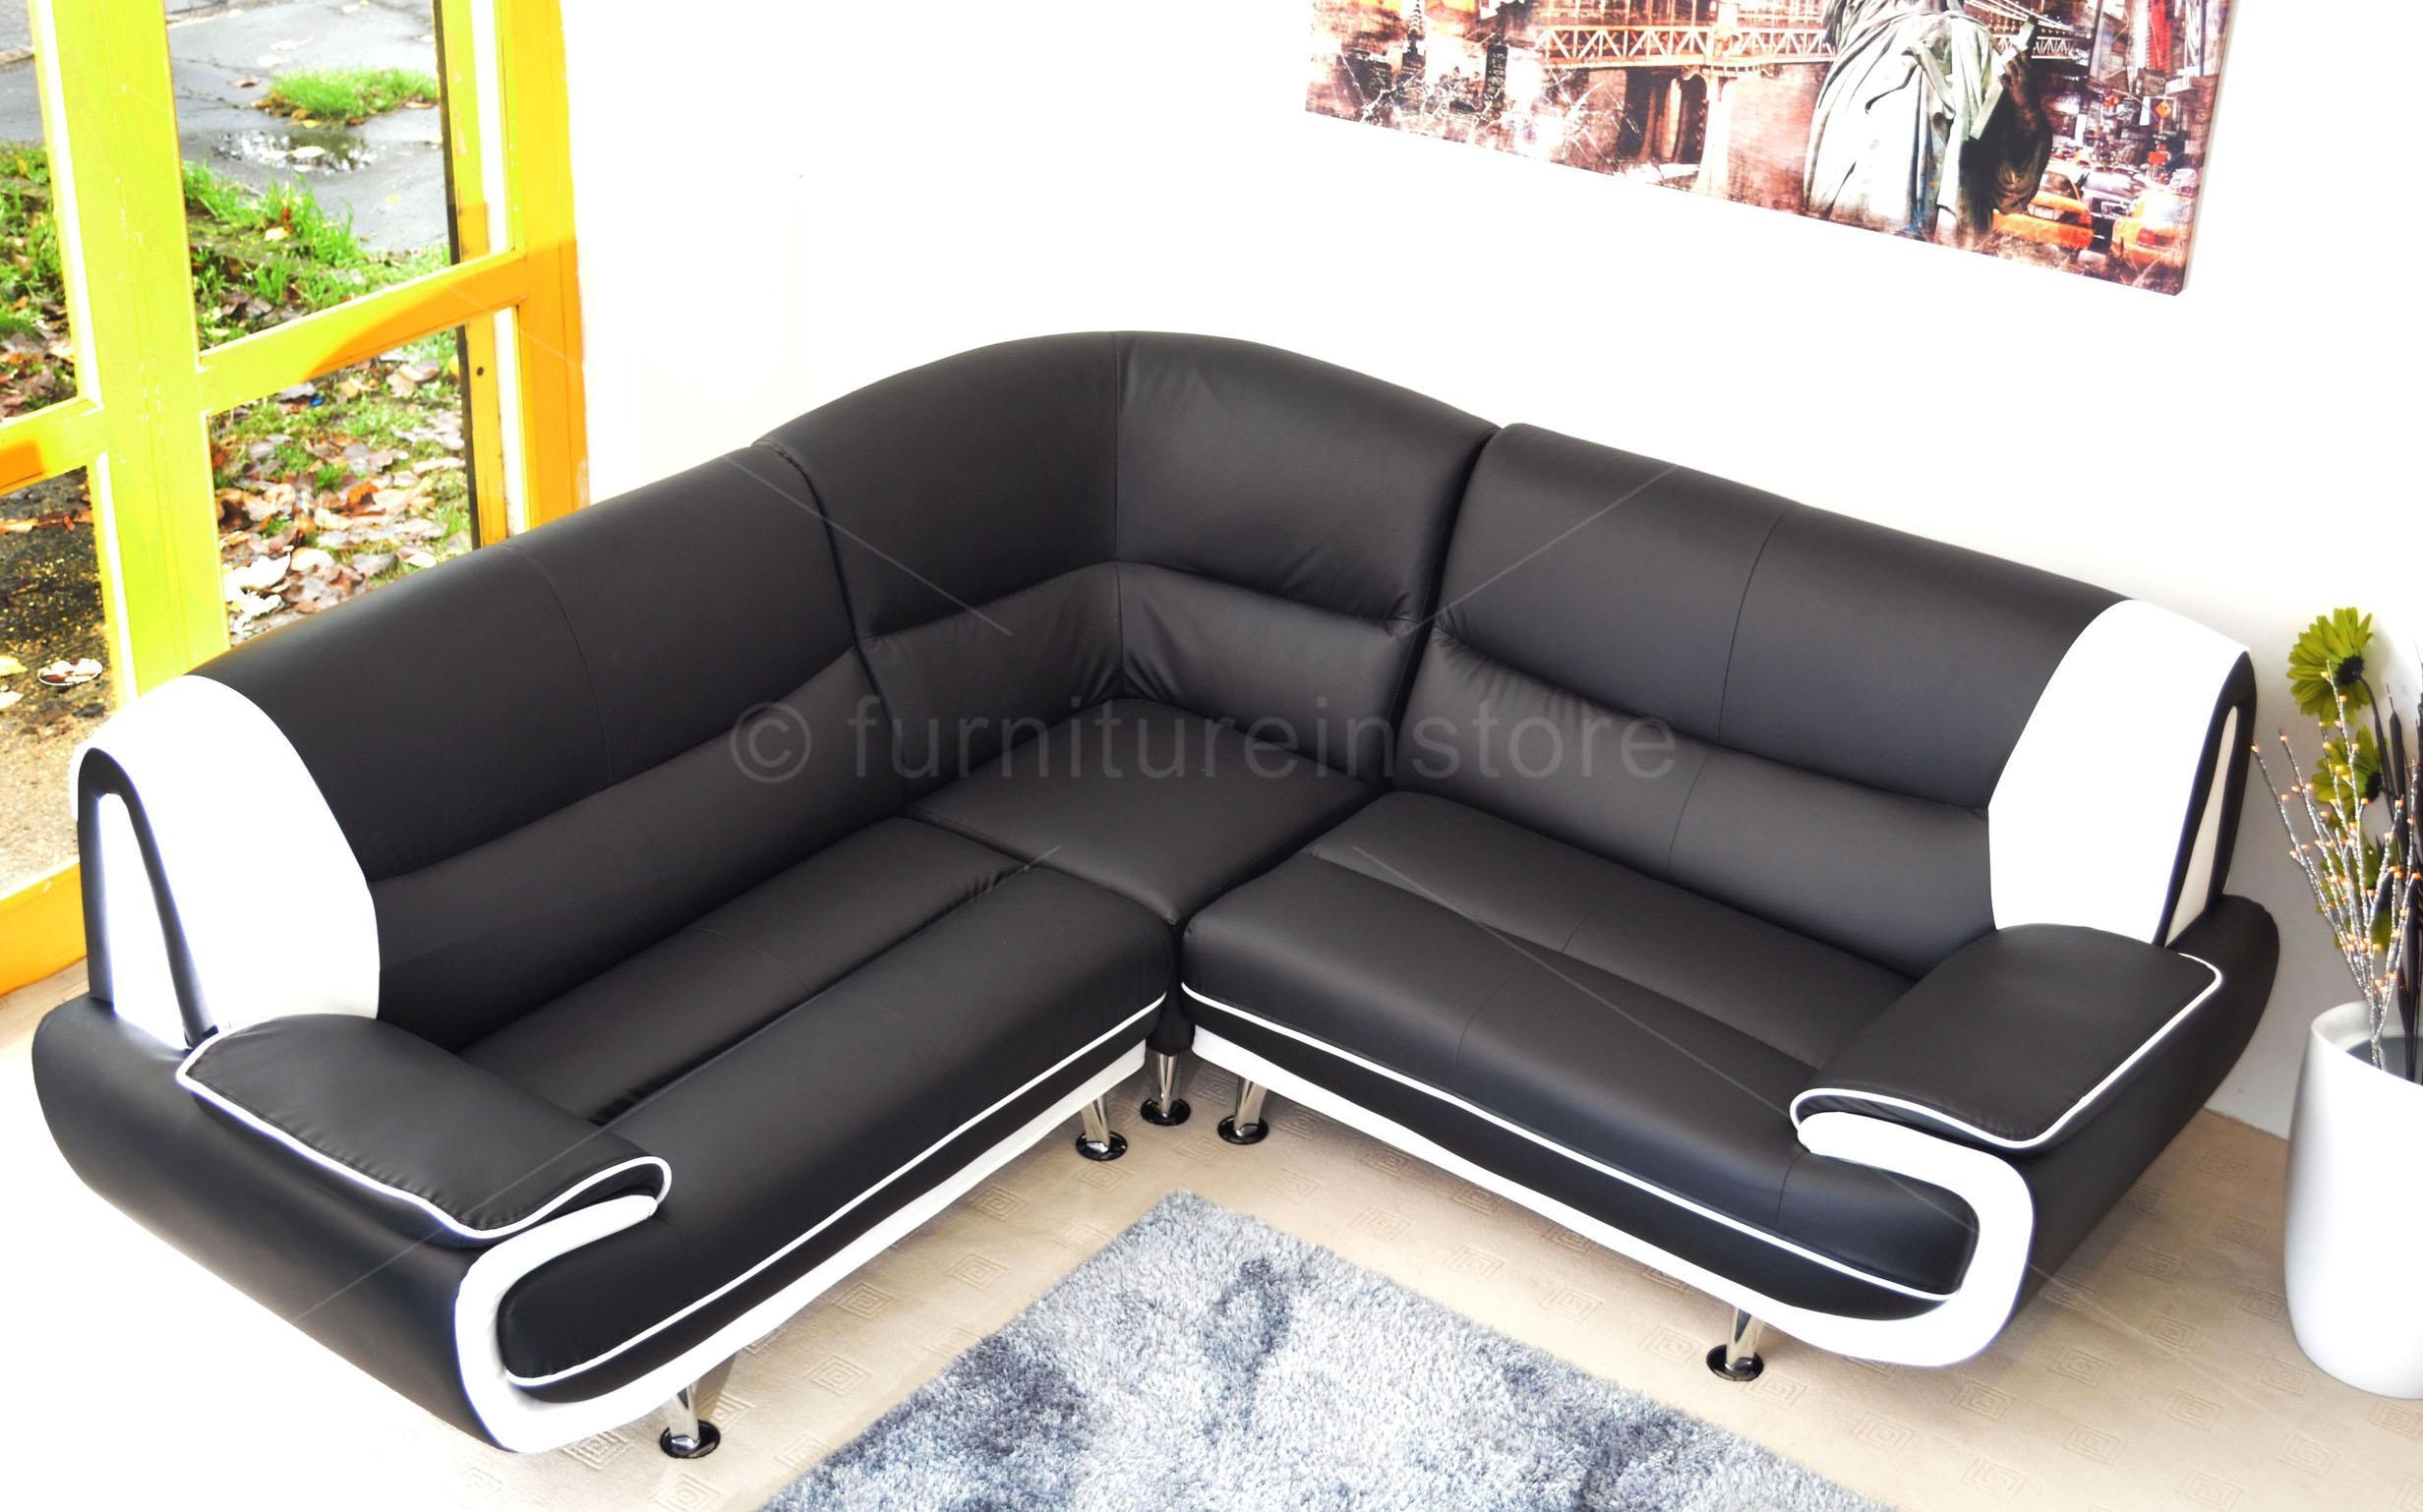 Corner Sofas For Sale Cheap | Tehranmix Decoration With Regard To Black Leather Corner Sofas (Image 5 of 20)